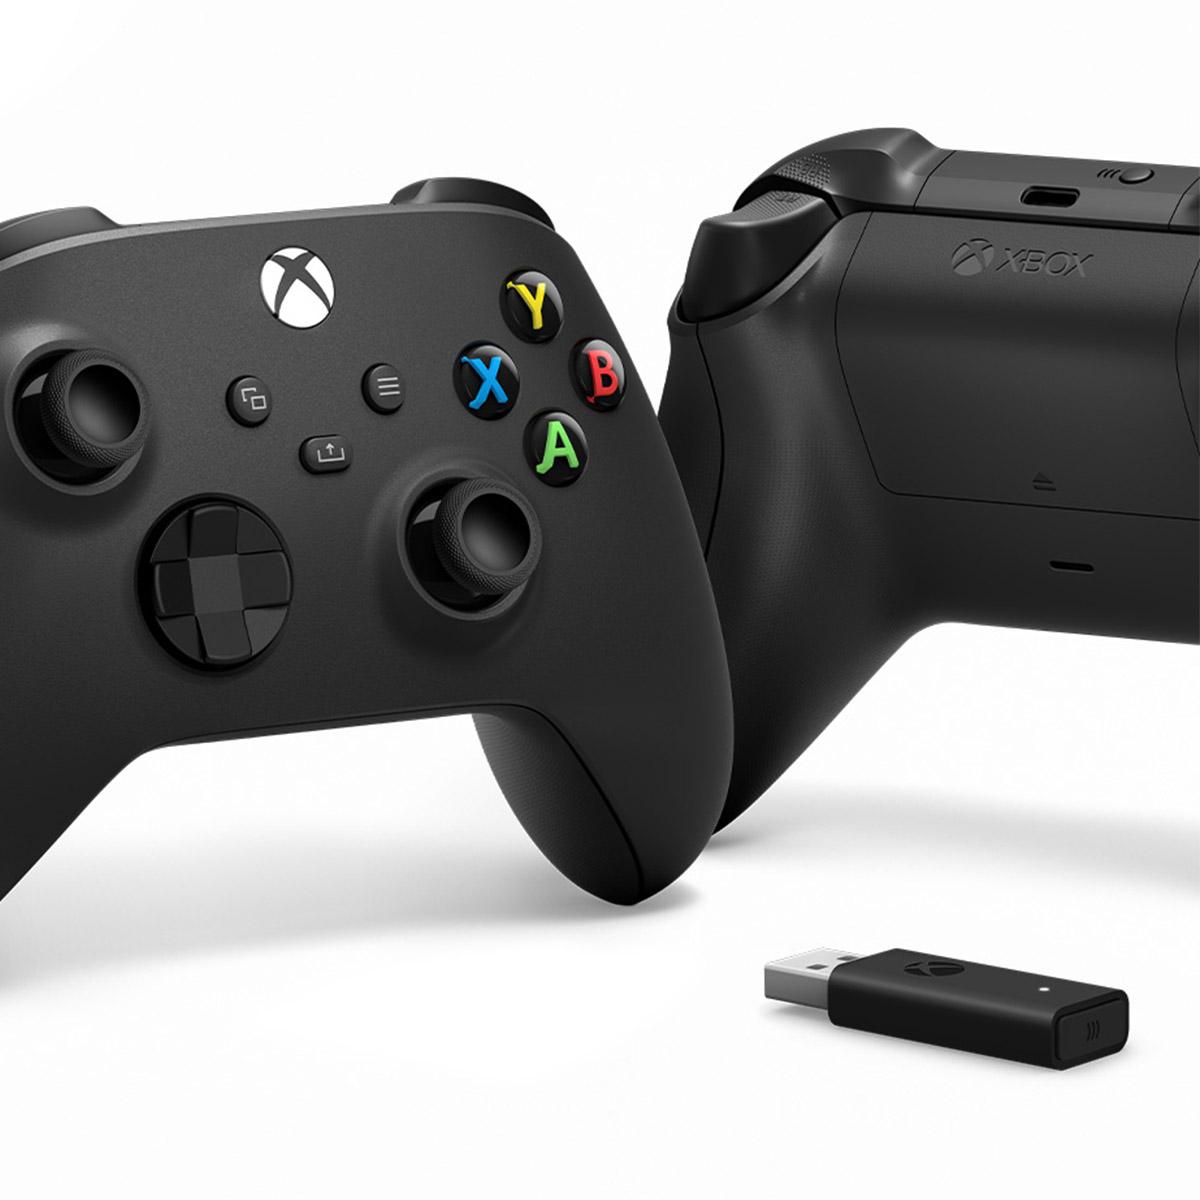 Как подключить геймпад Xbox к ПК через адаптер